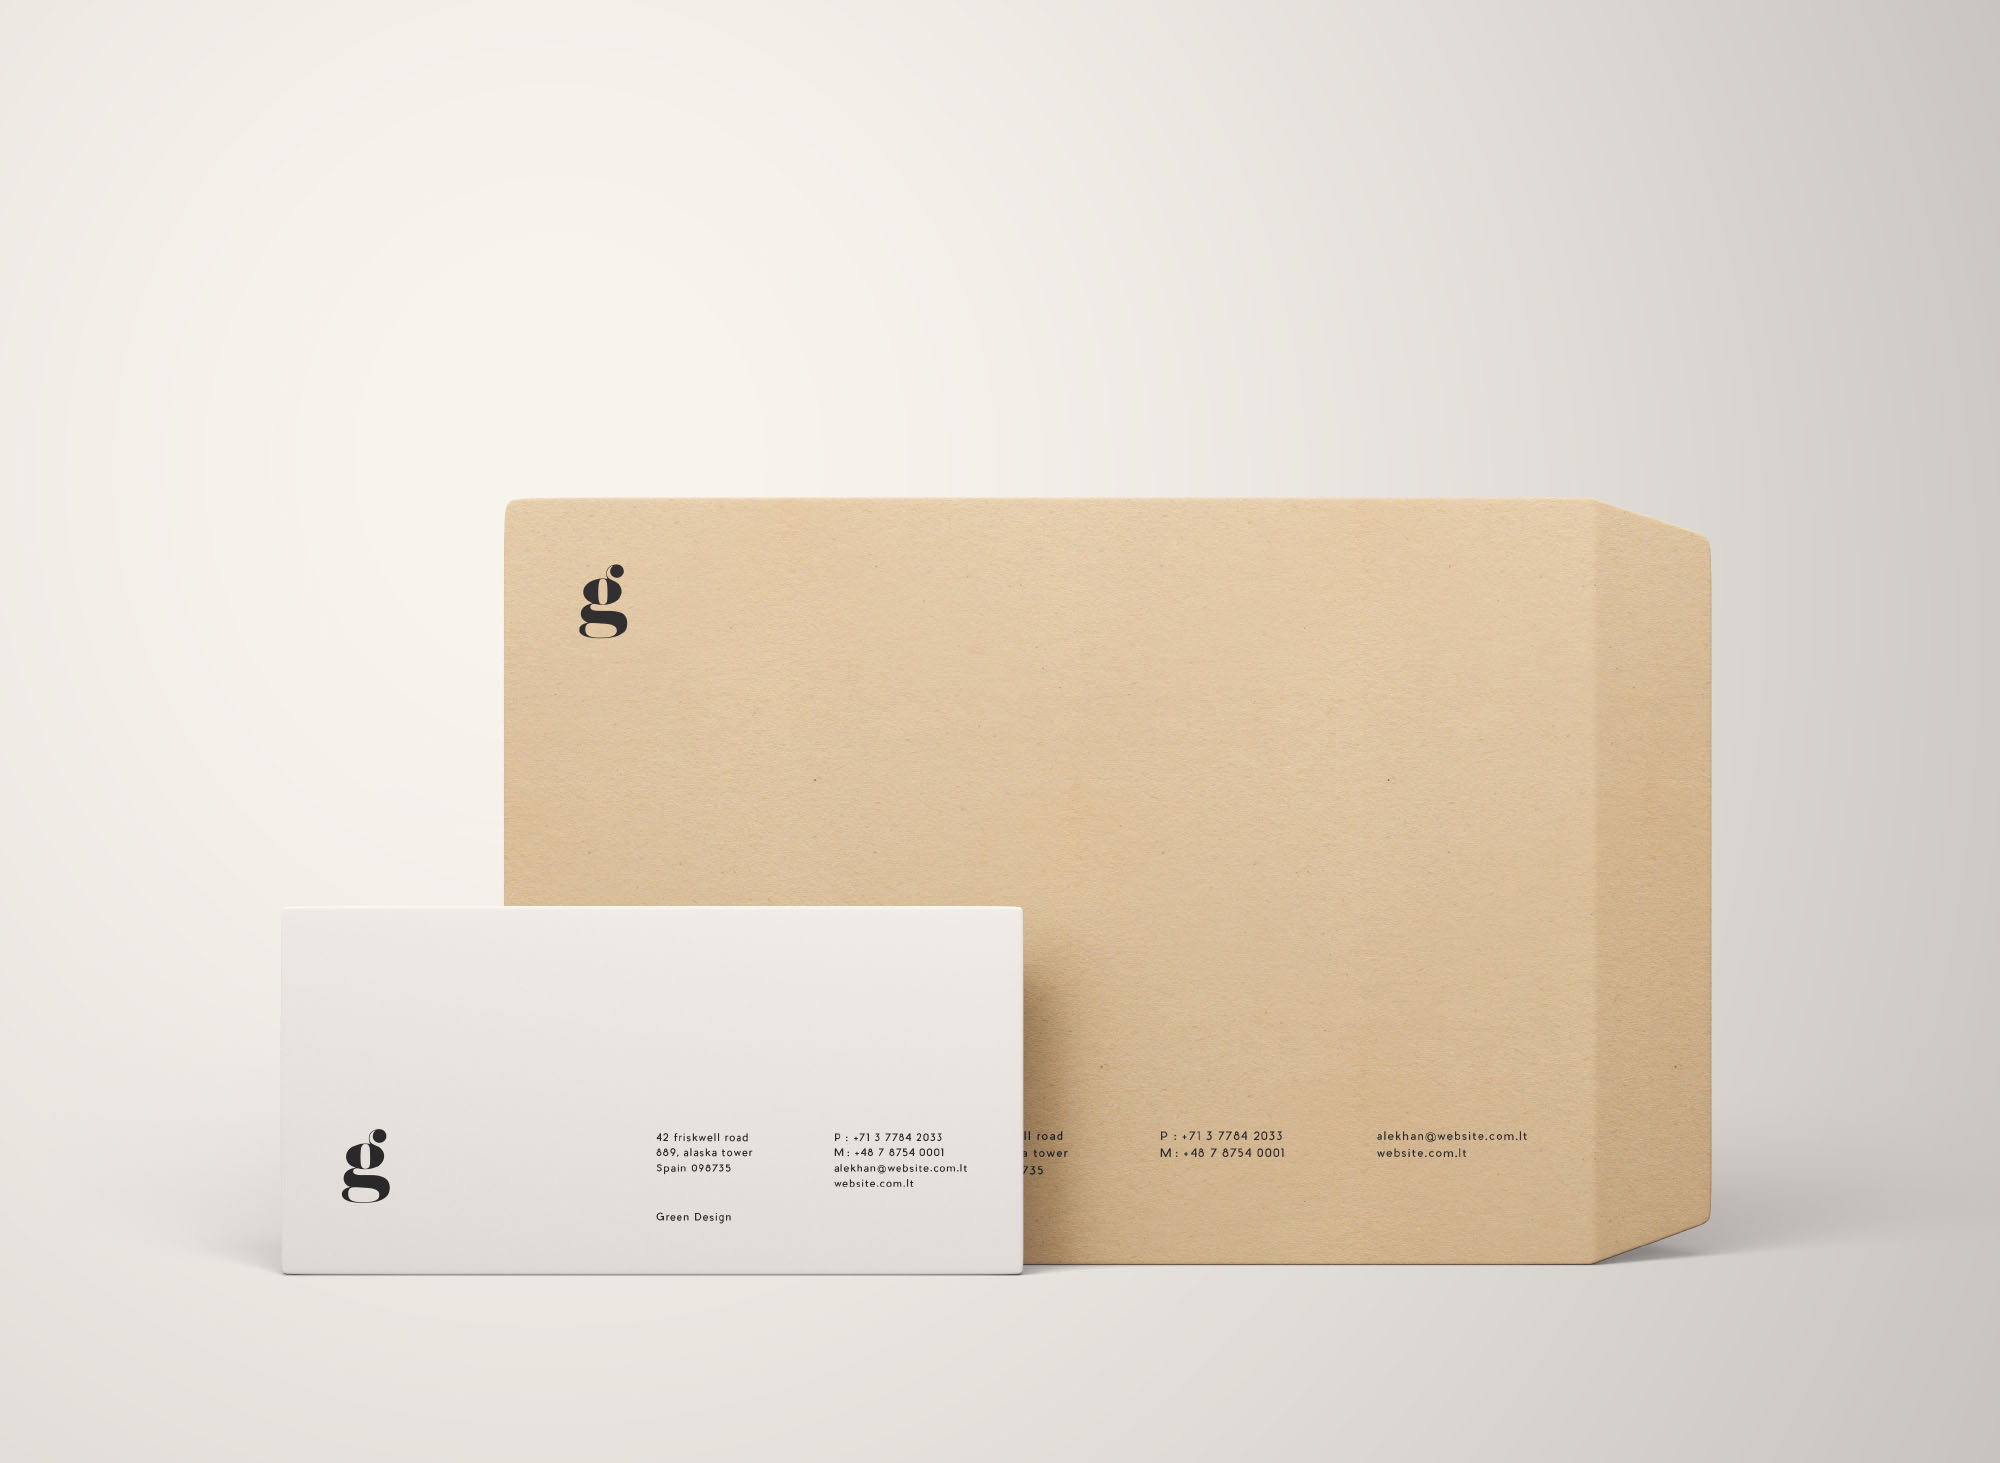 Two Size Envelope Mockups Psd